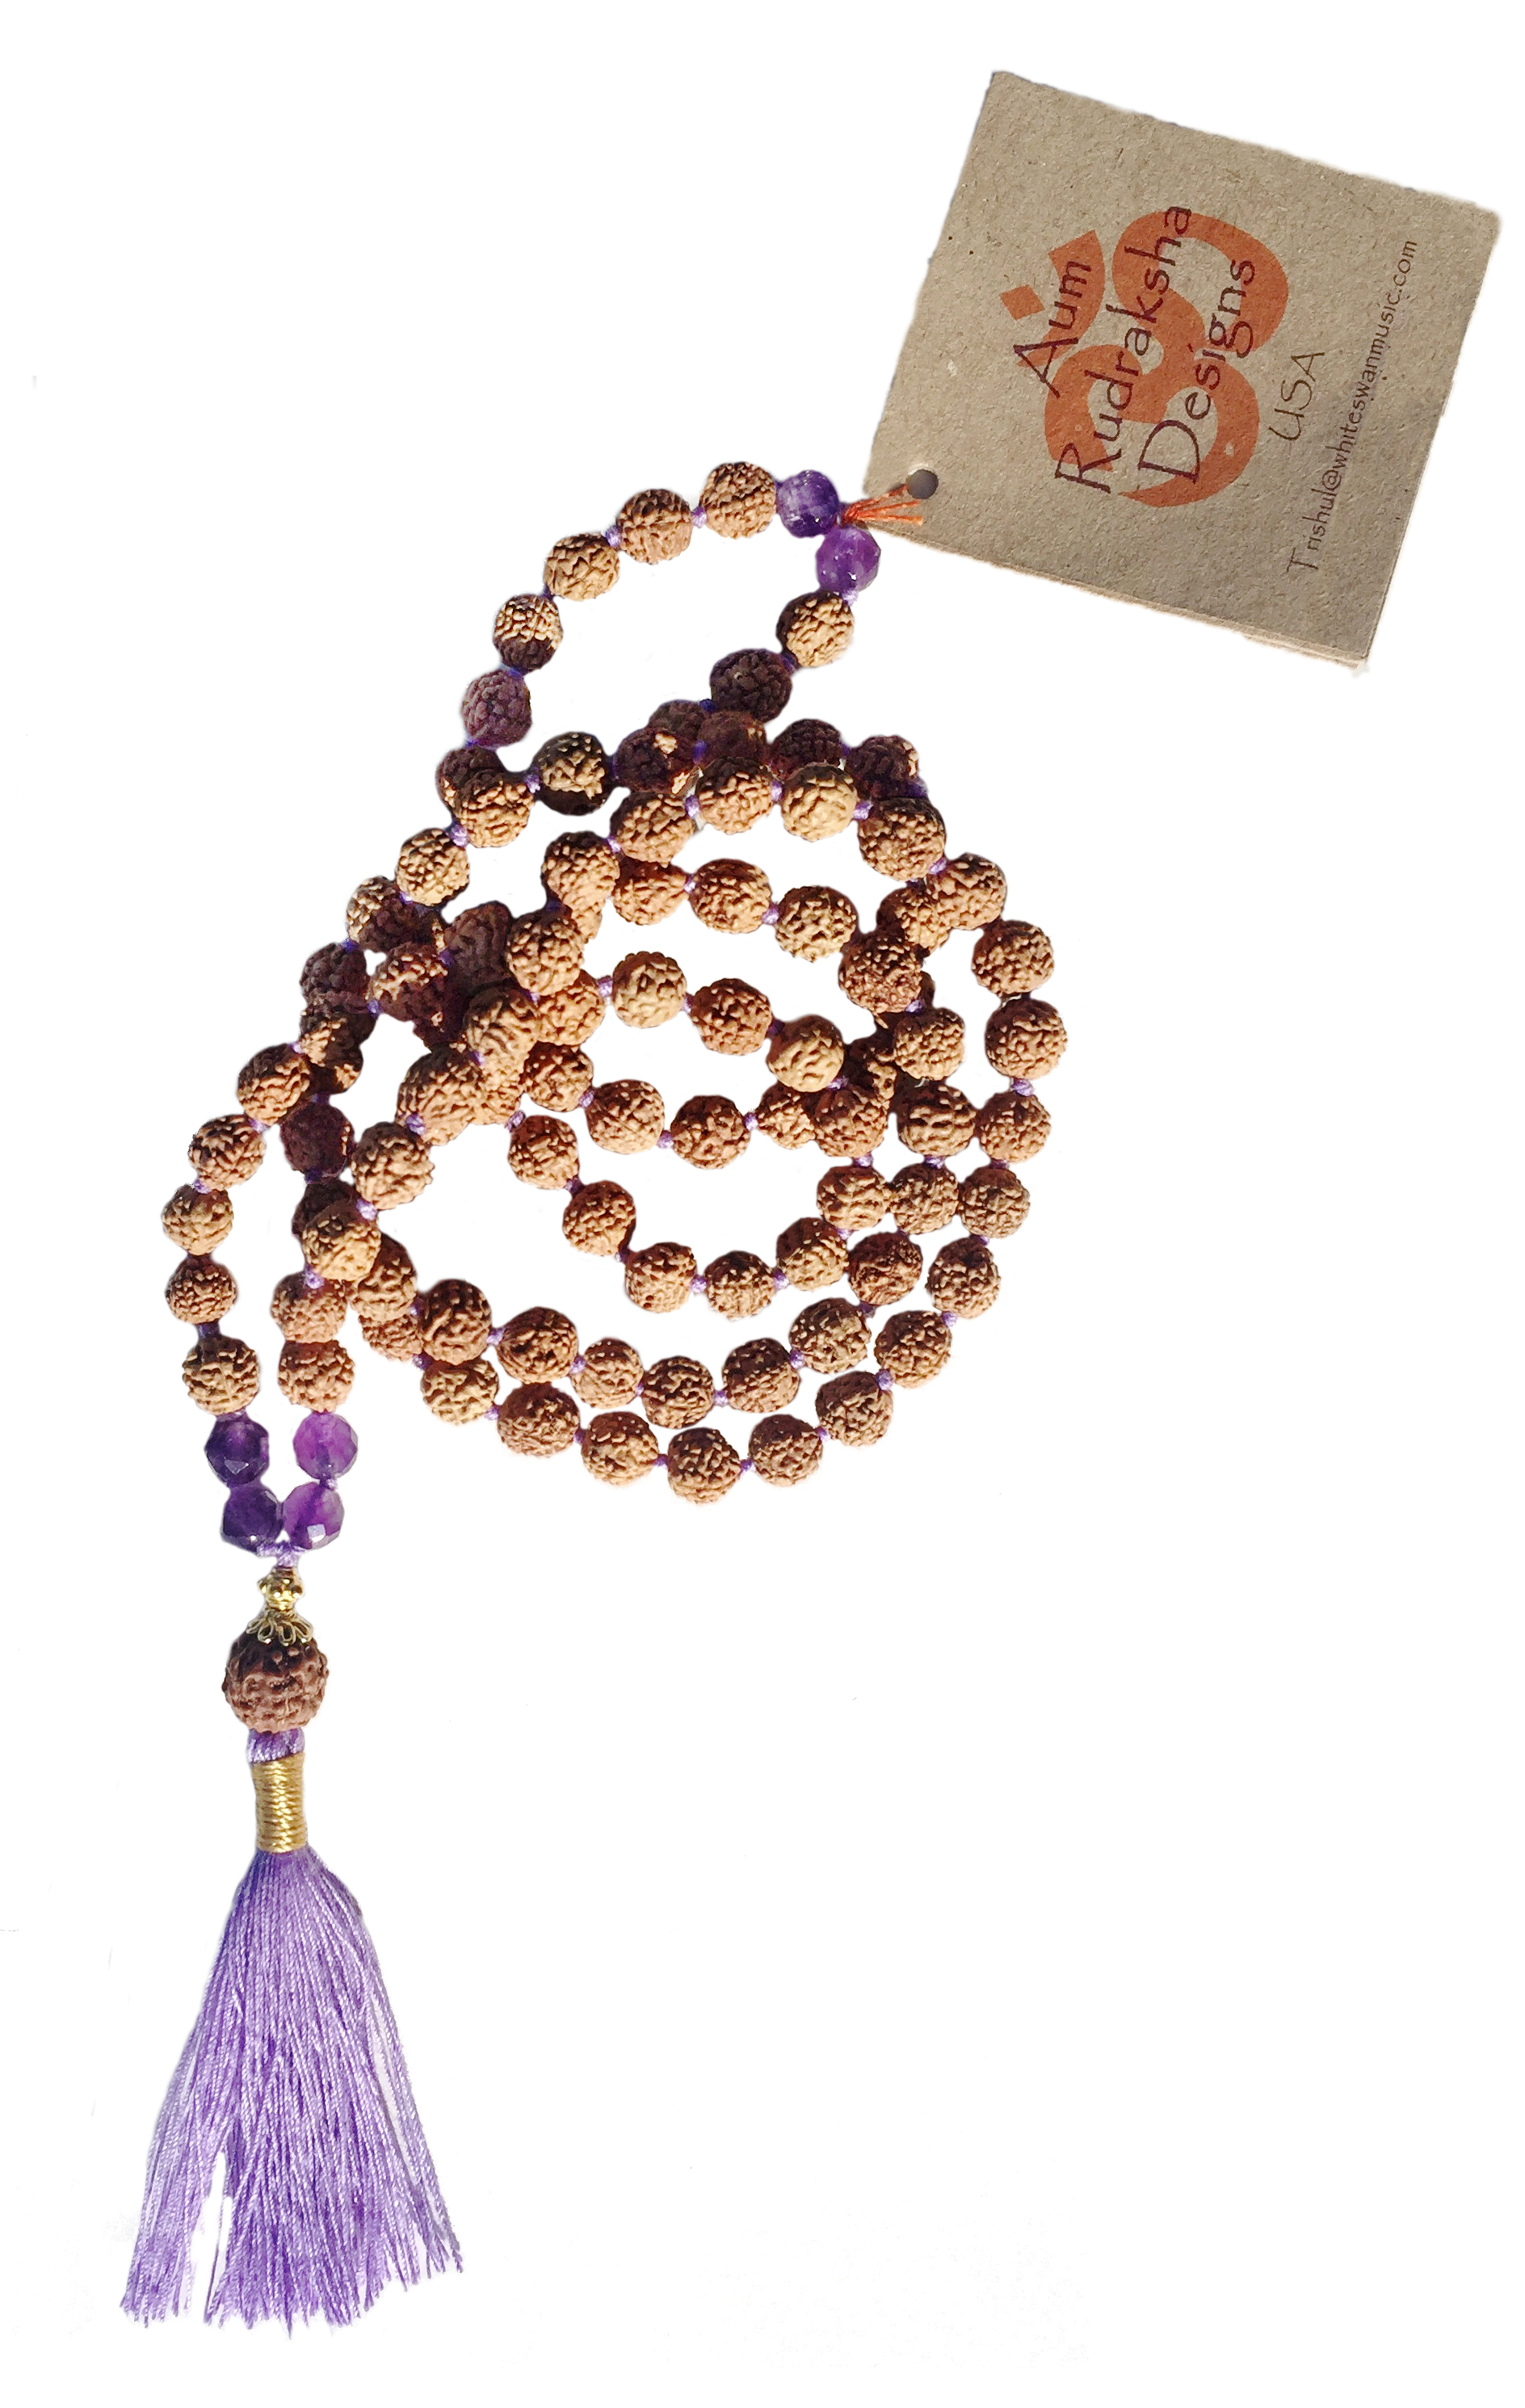 Rudraksha Yogi Mala Amethyst - 108 beads